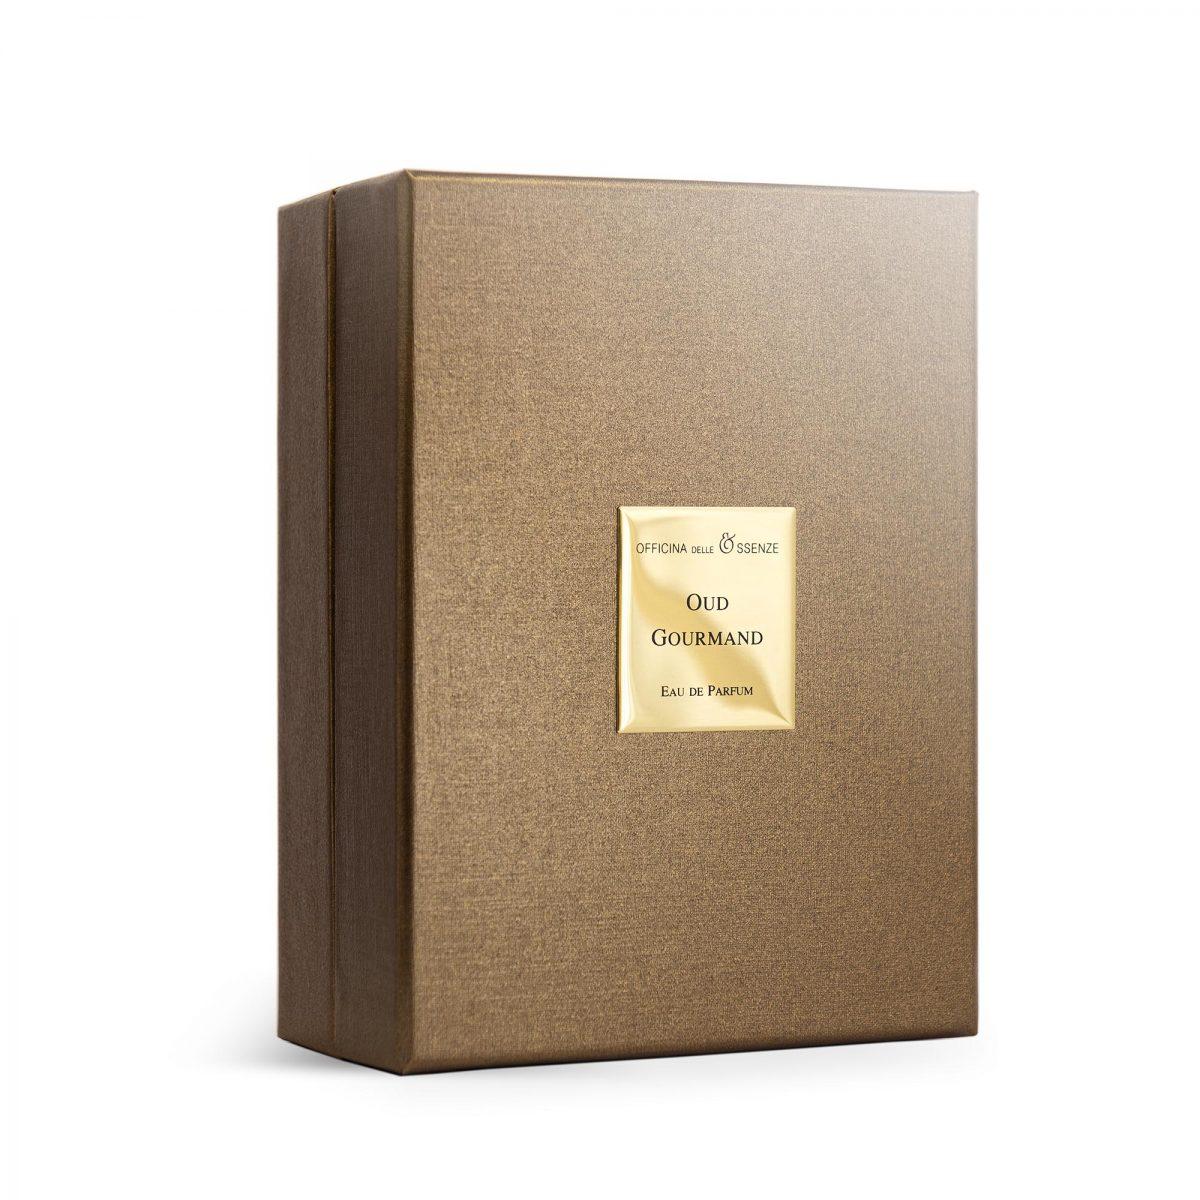 Officina delle Essenze box Oud